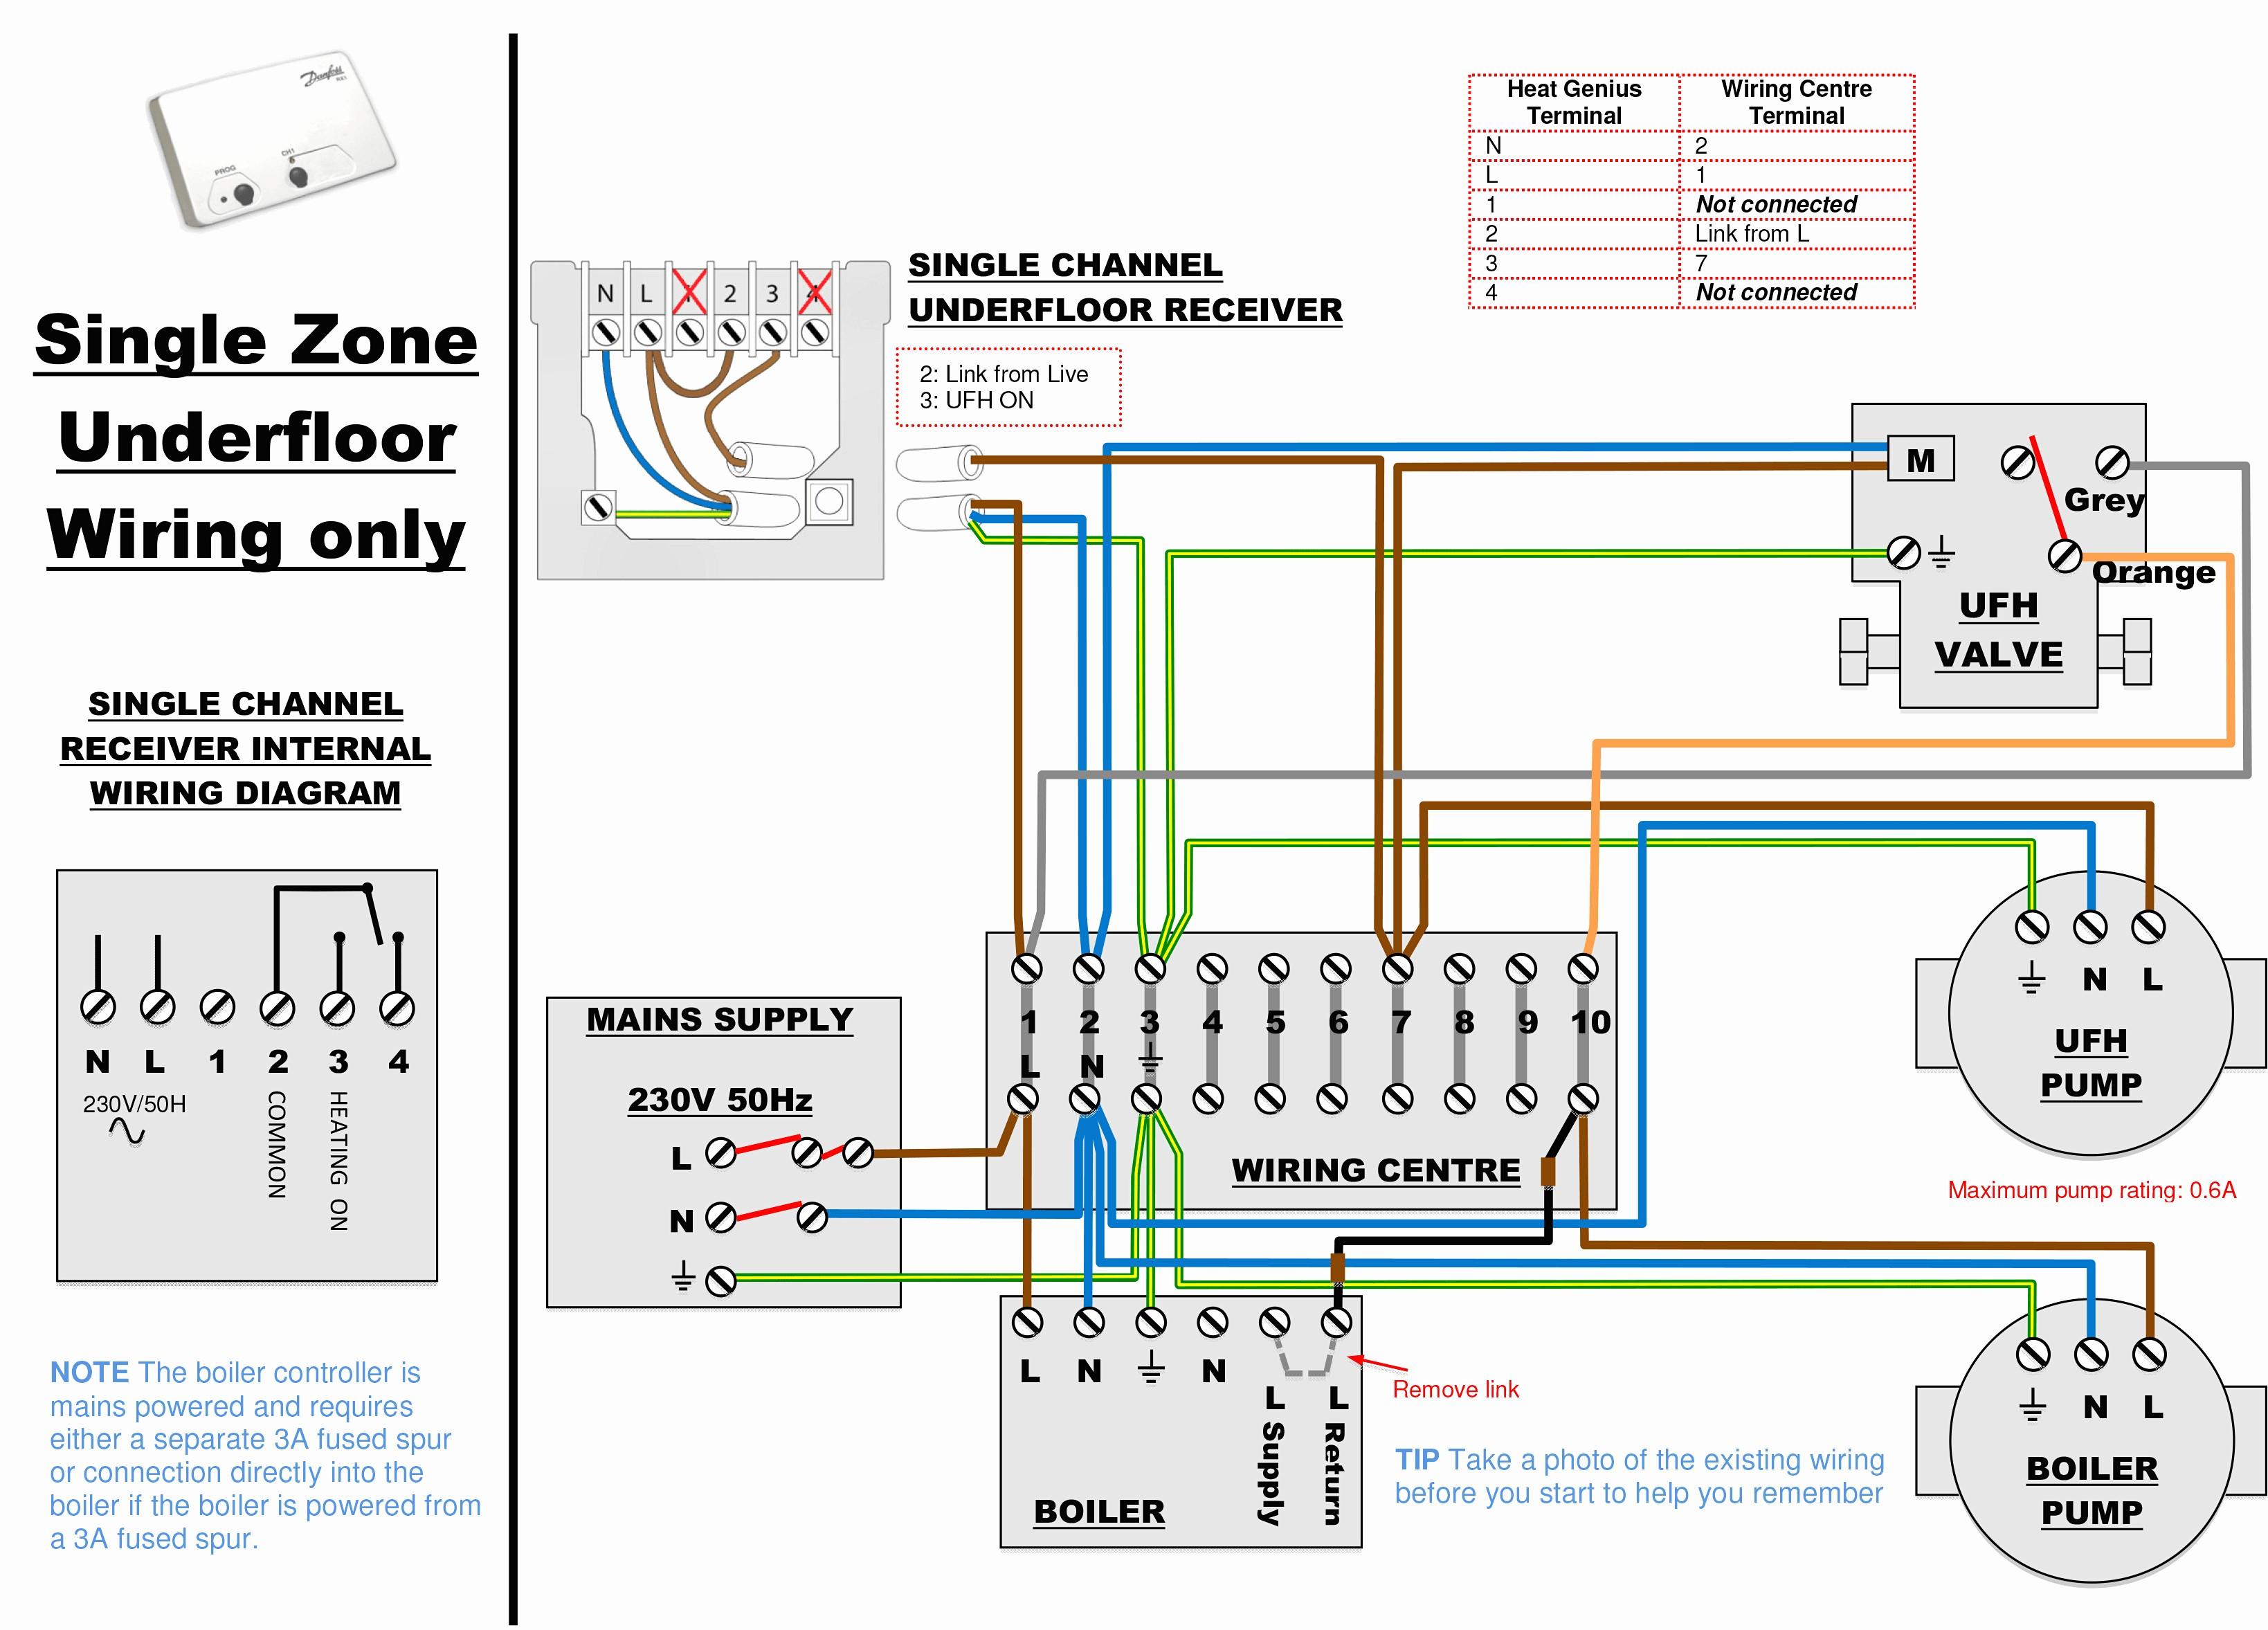 underfloor heating wiring diagrams ccfd14nibibliofemnl